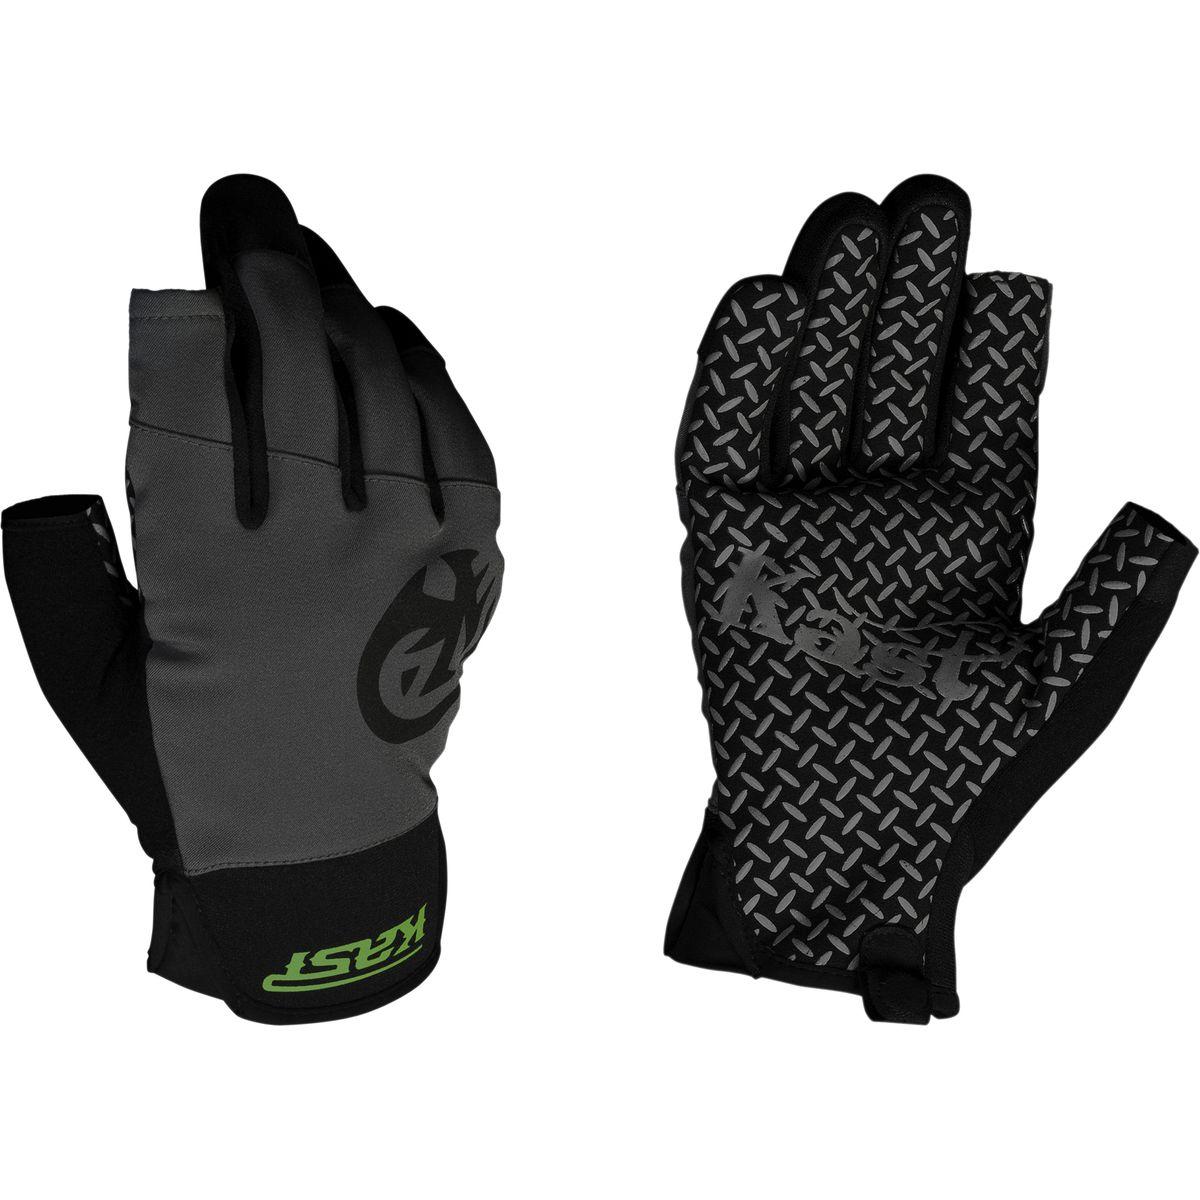 Kast Gear Raptor Trigger Glove